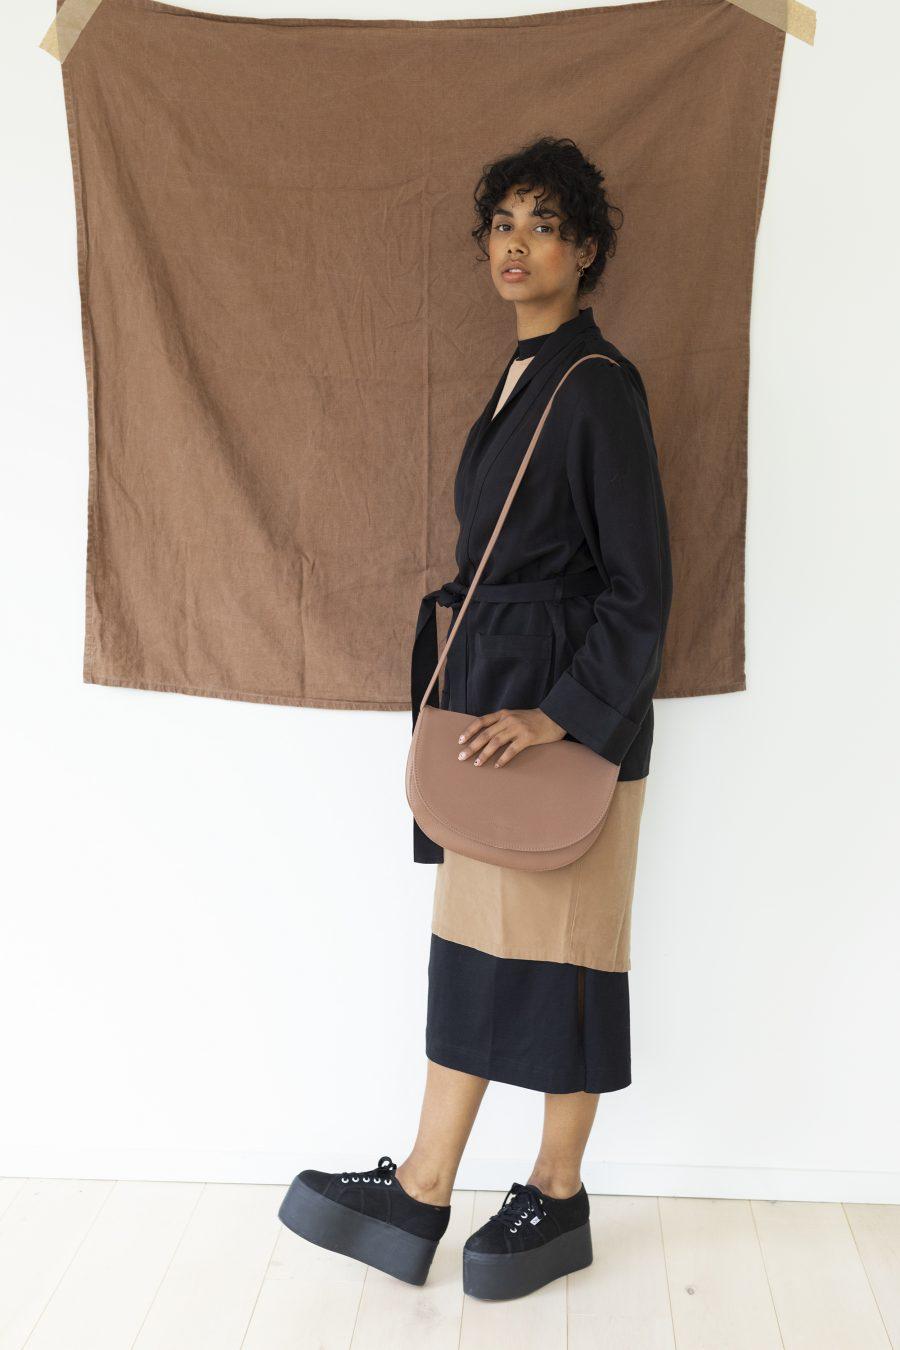 1601356 – Monk & Anna – style – Soma half moon bag – Chestnut